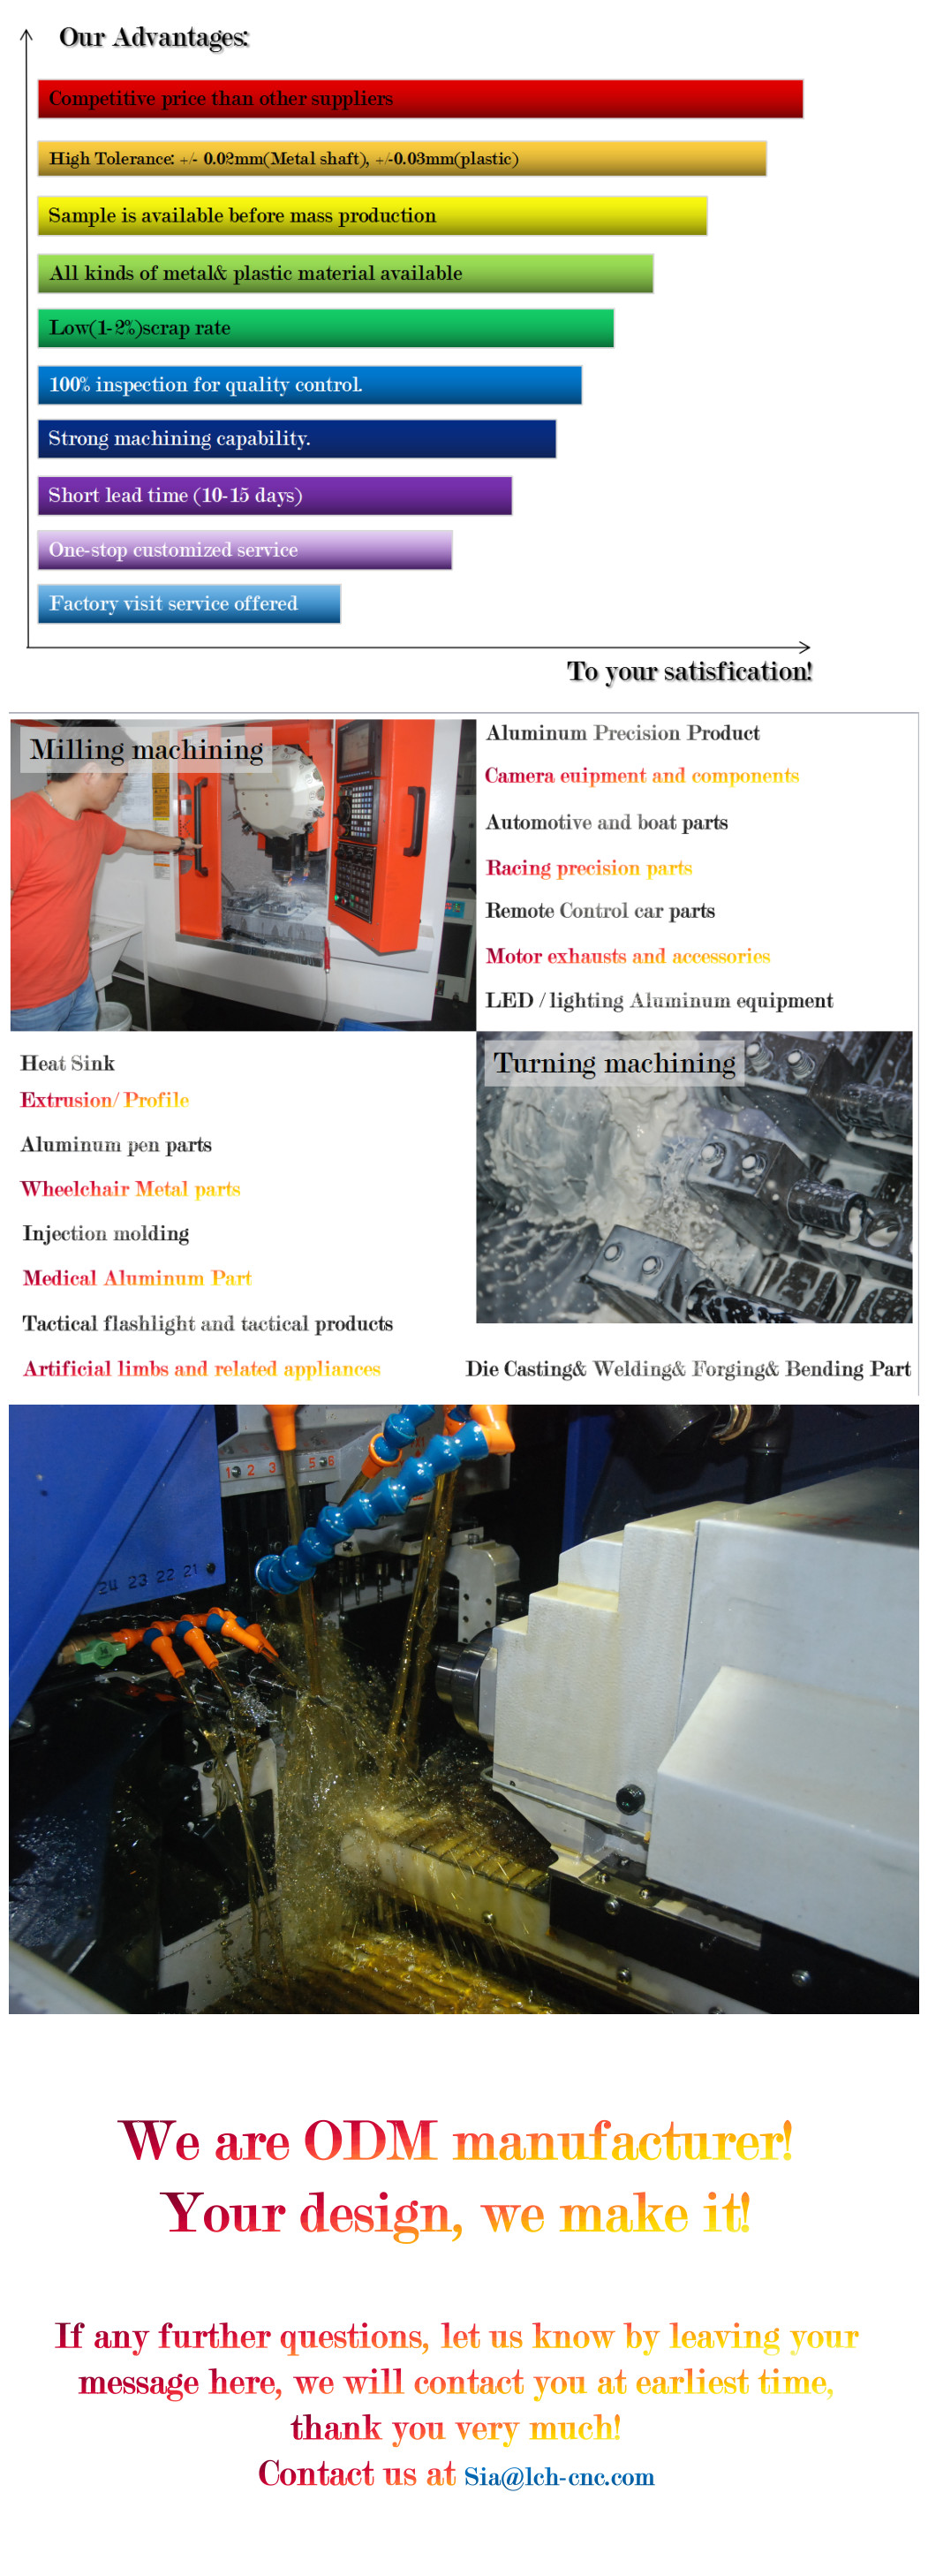 cnc manufacturer.jpg